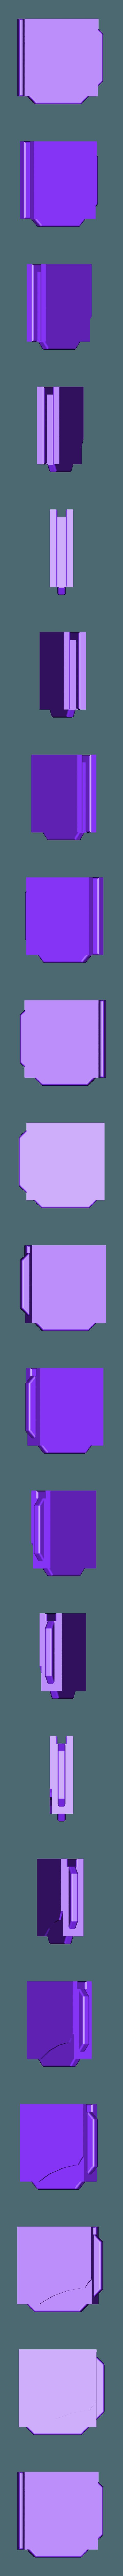 Piece - Part 1.stl Download free STL file Taquin CULTS / Sliding Puzzle • 3D print model, Valelab3D